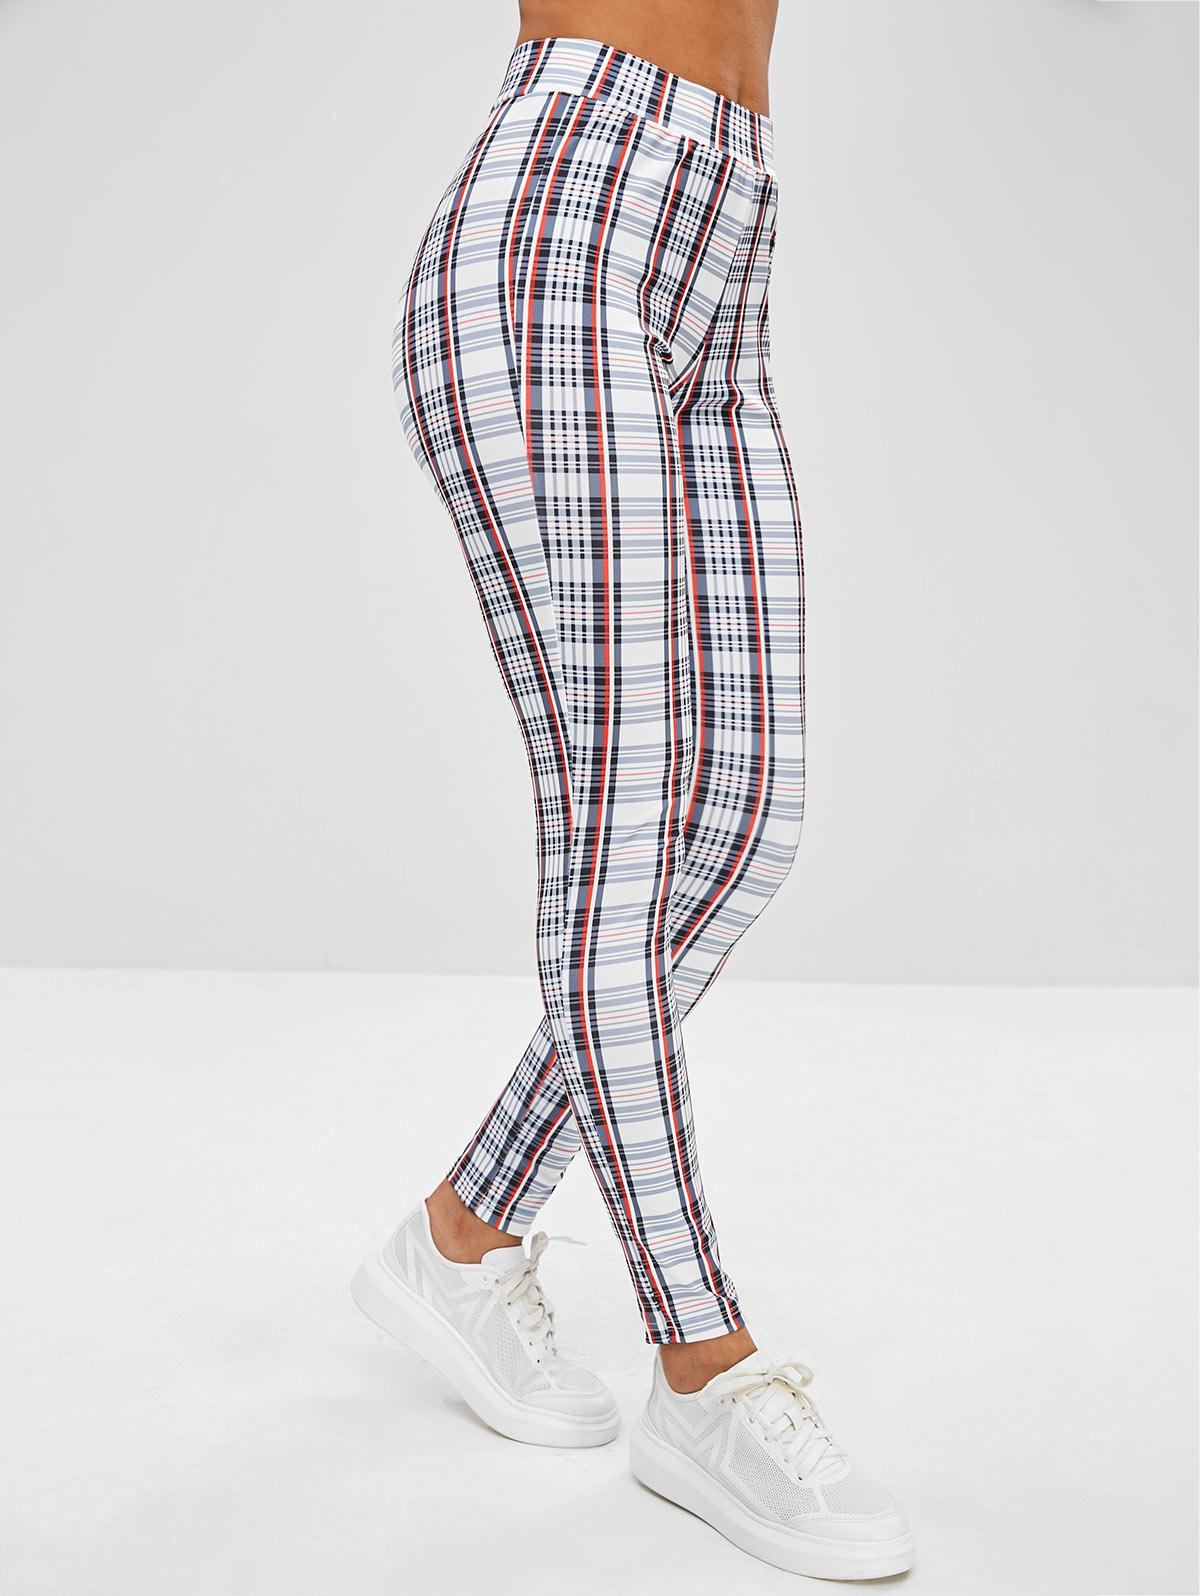 Zaful coupon: Plaid Skinny Pants